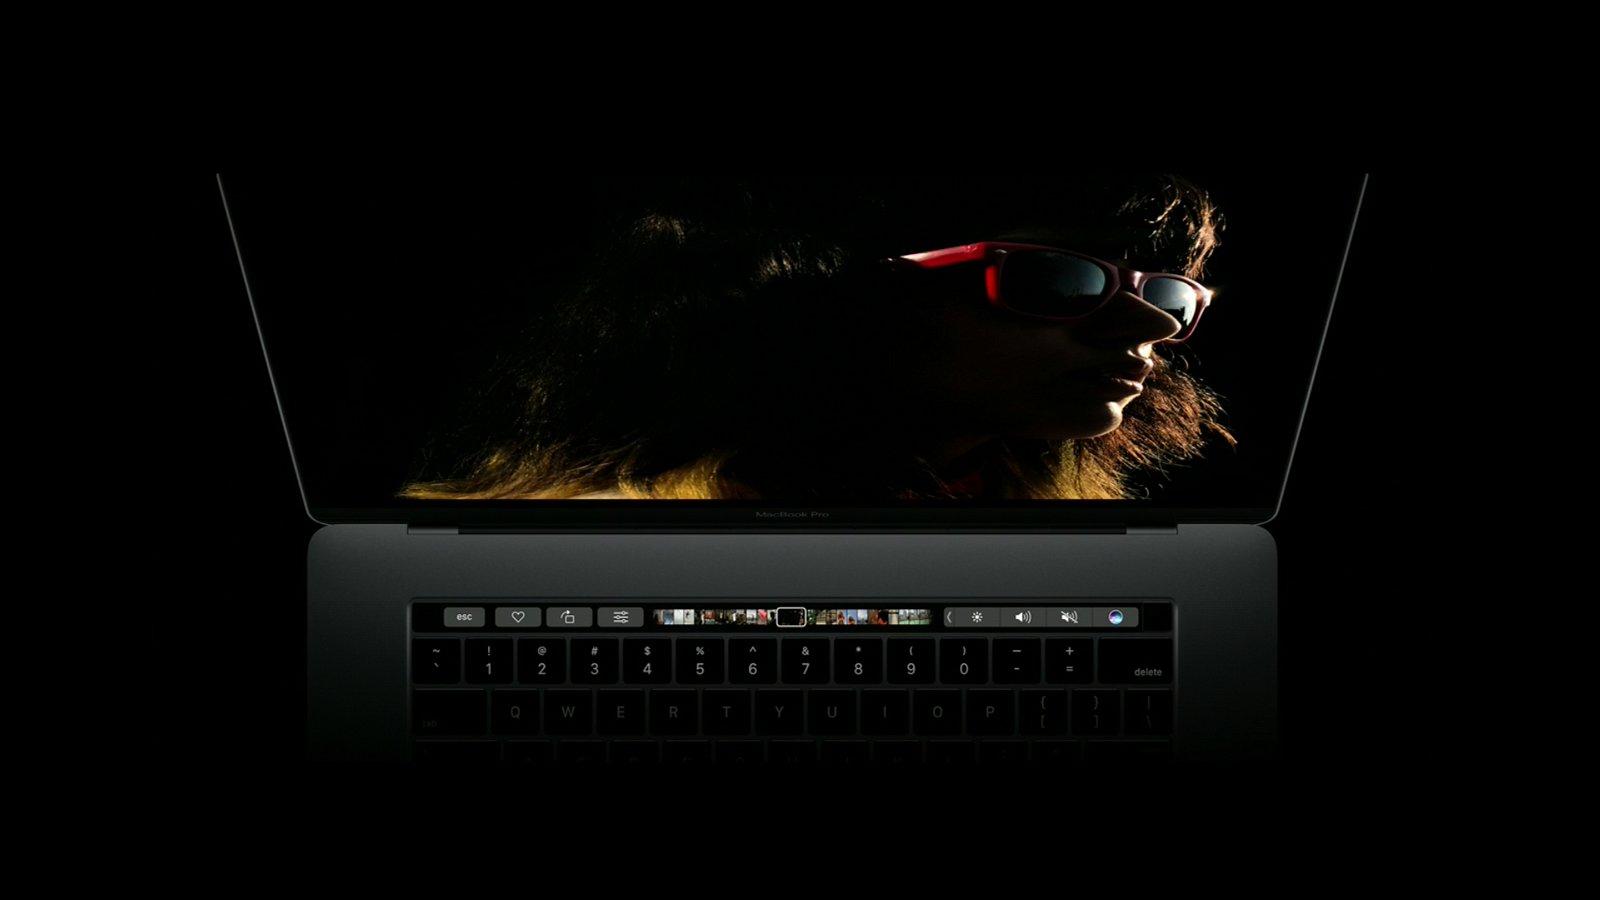 New MacBook Pro Brings Touch Bar, Sleekier Design Challenges MacBook Air